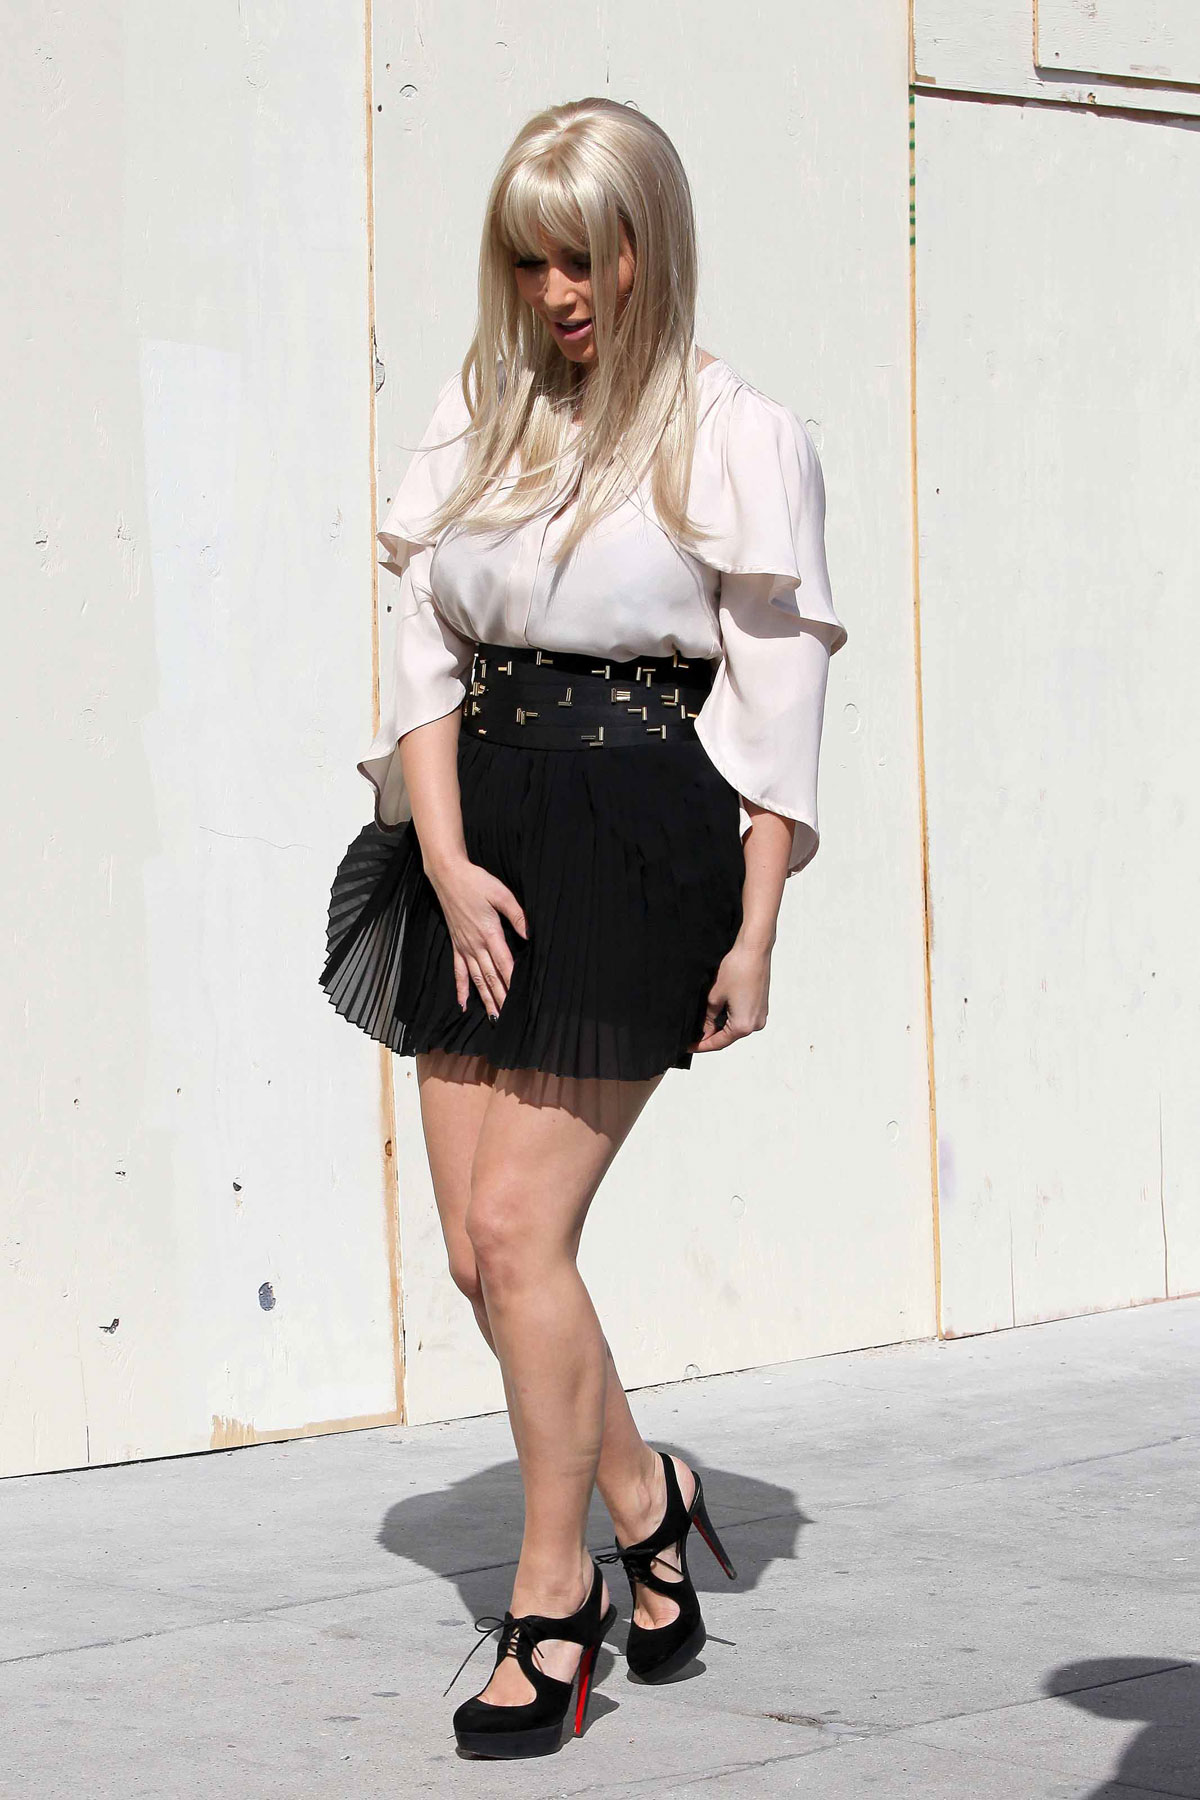 Kim Kardashian Leggy At Samuel French Bookshop In